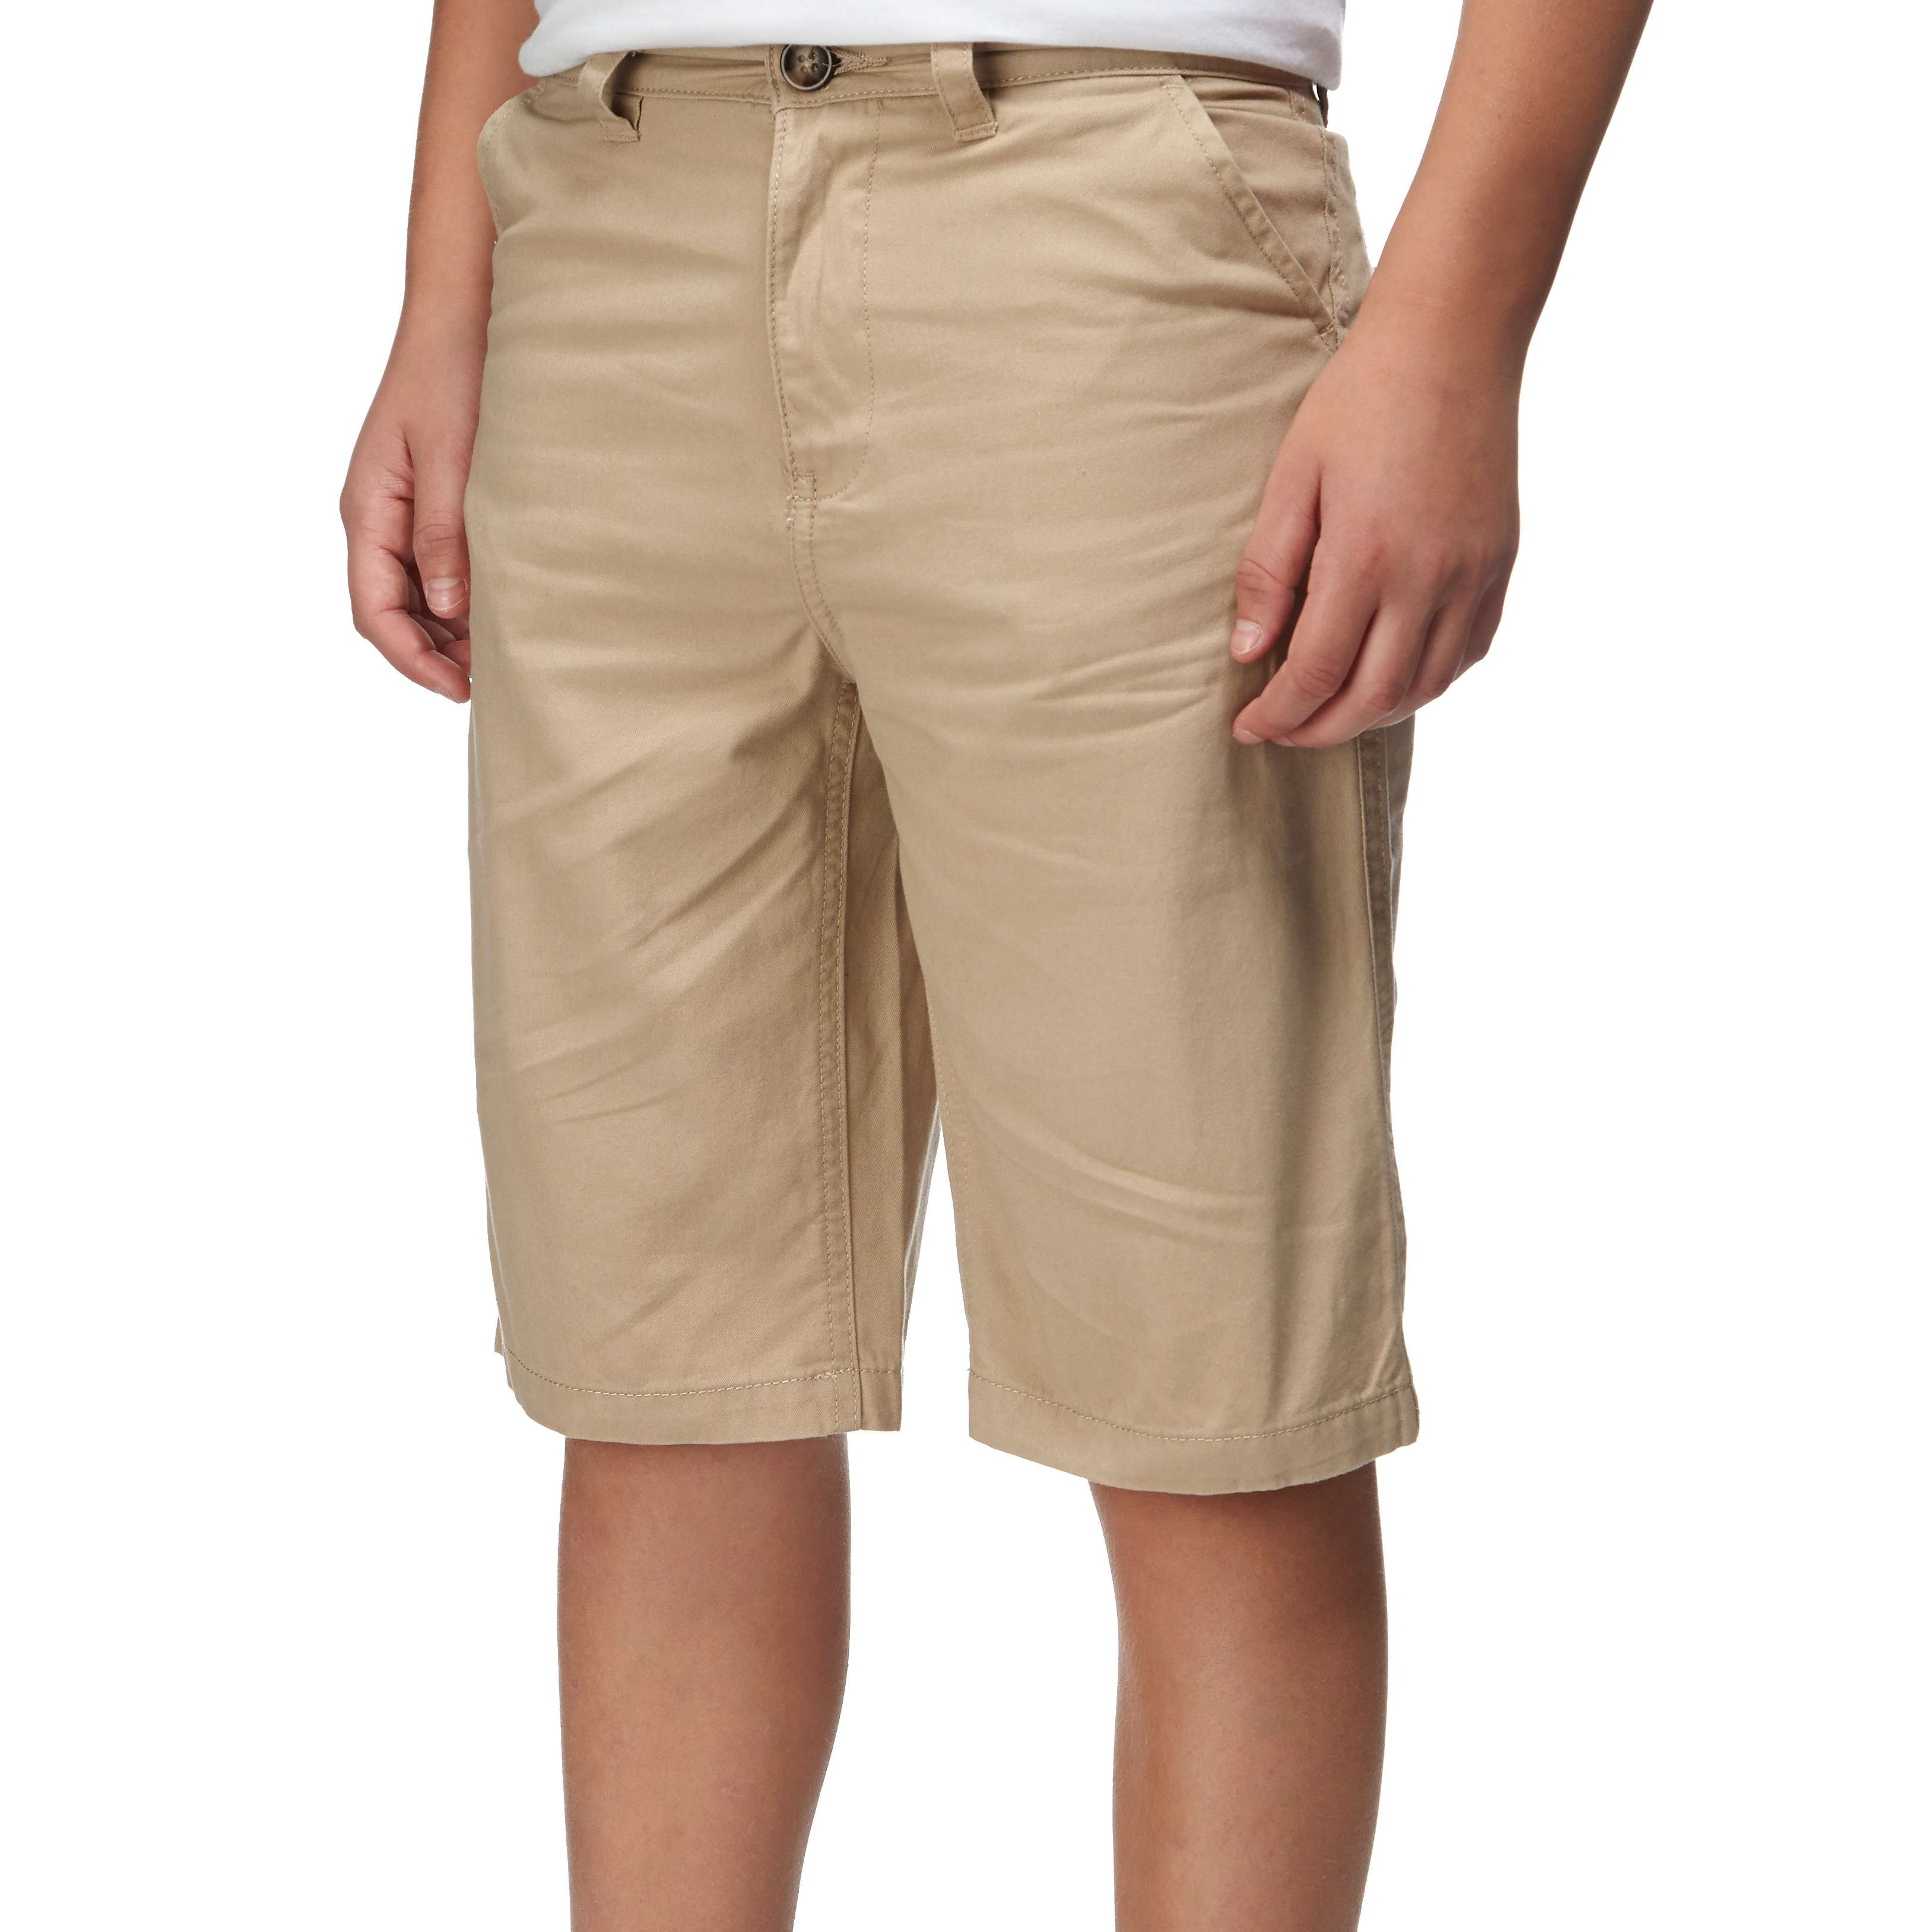 PETER STORM Boys' Chino Shorts